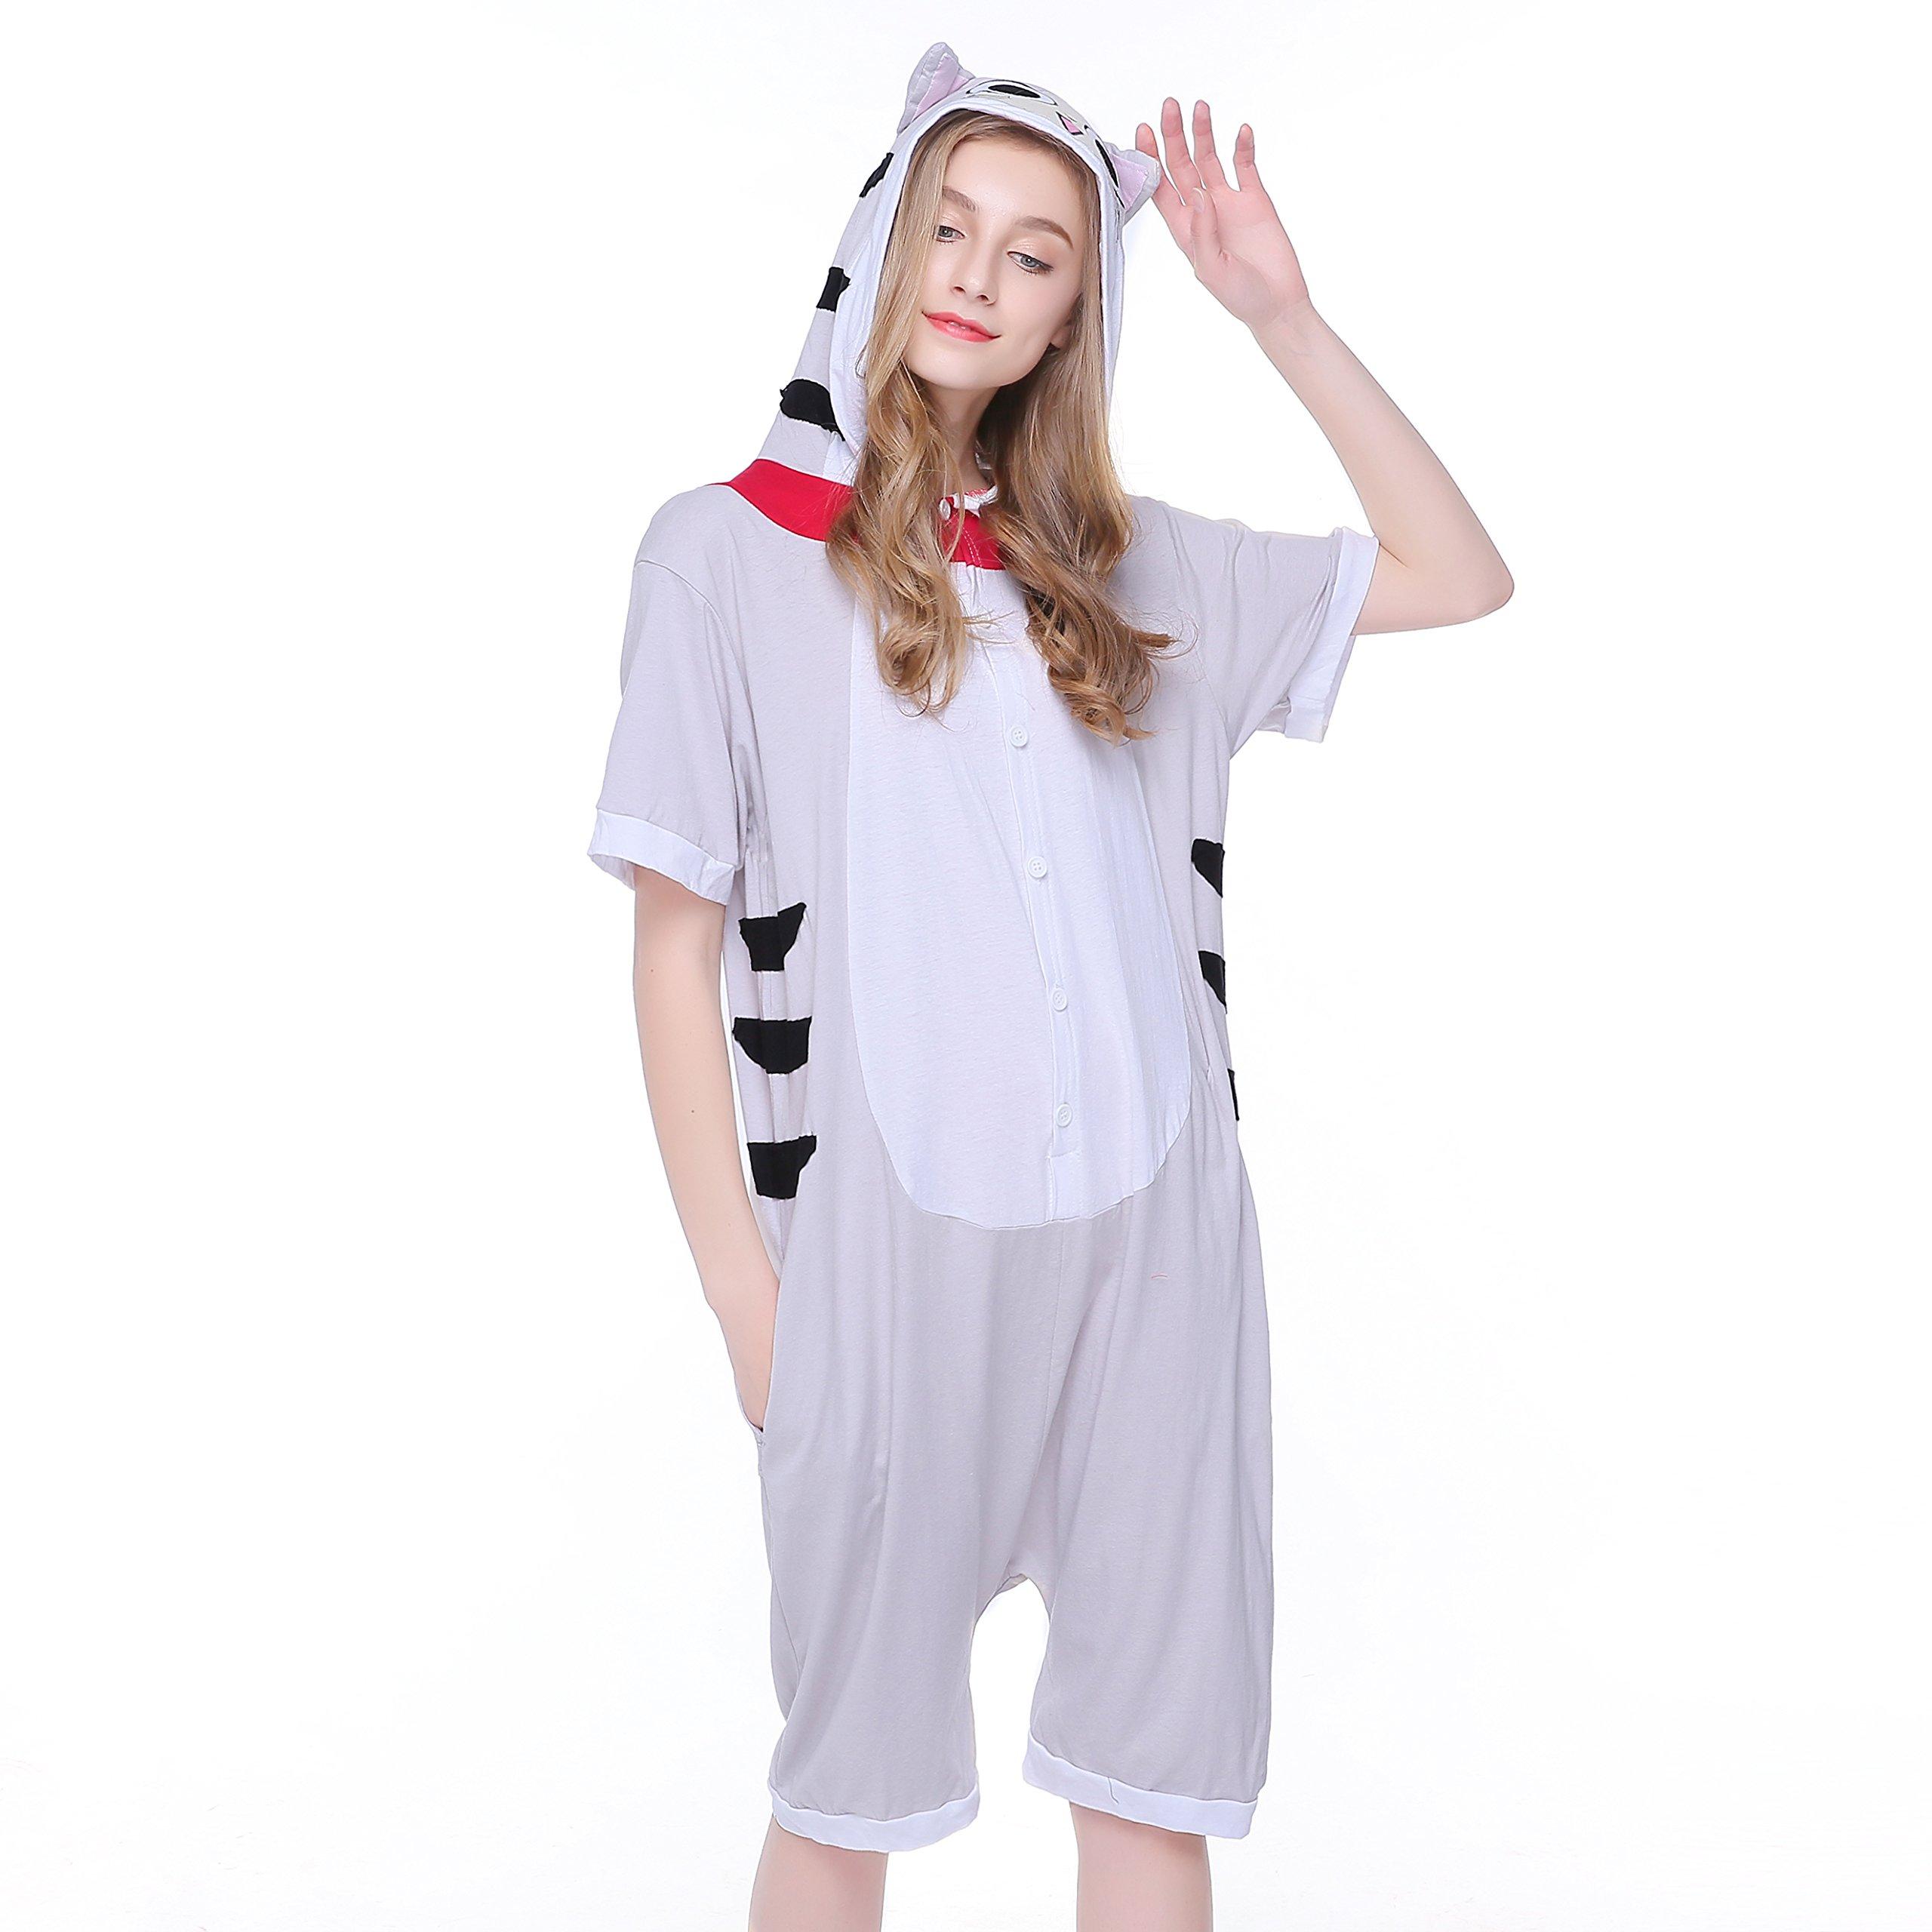 kxry Cat Cartoon Costume Unisex Adult Cosplay Pajamas Onesies Summer (X-Large)